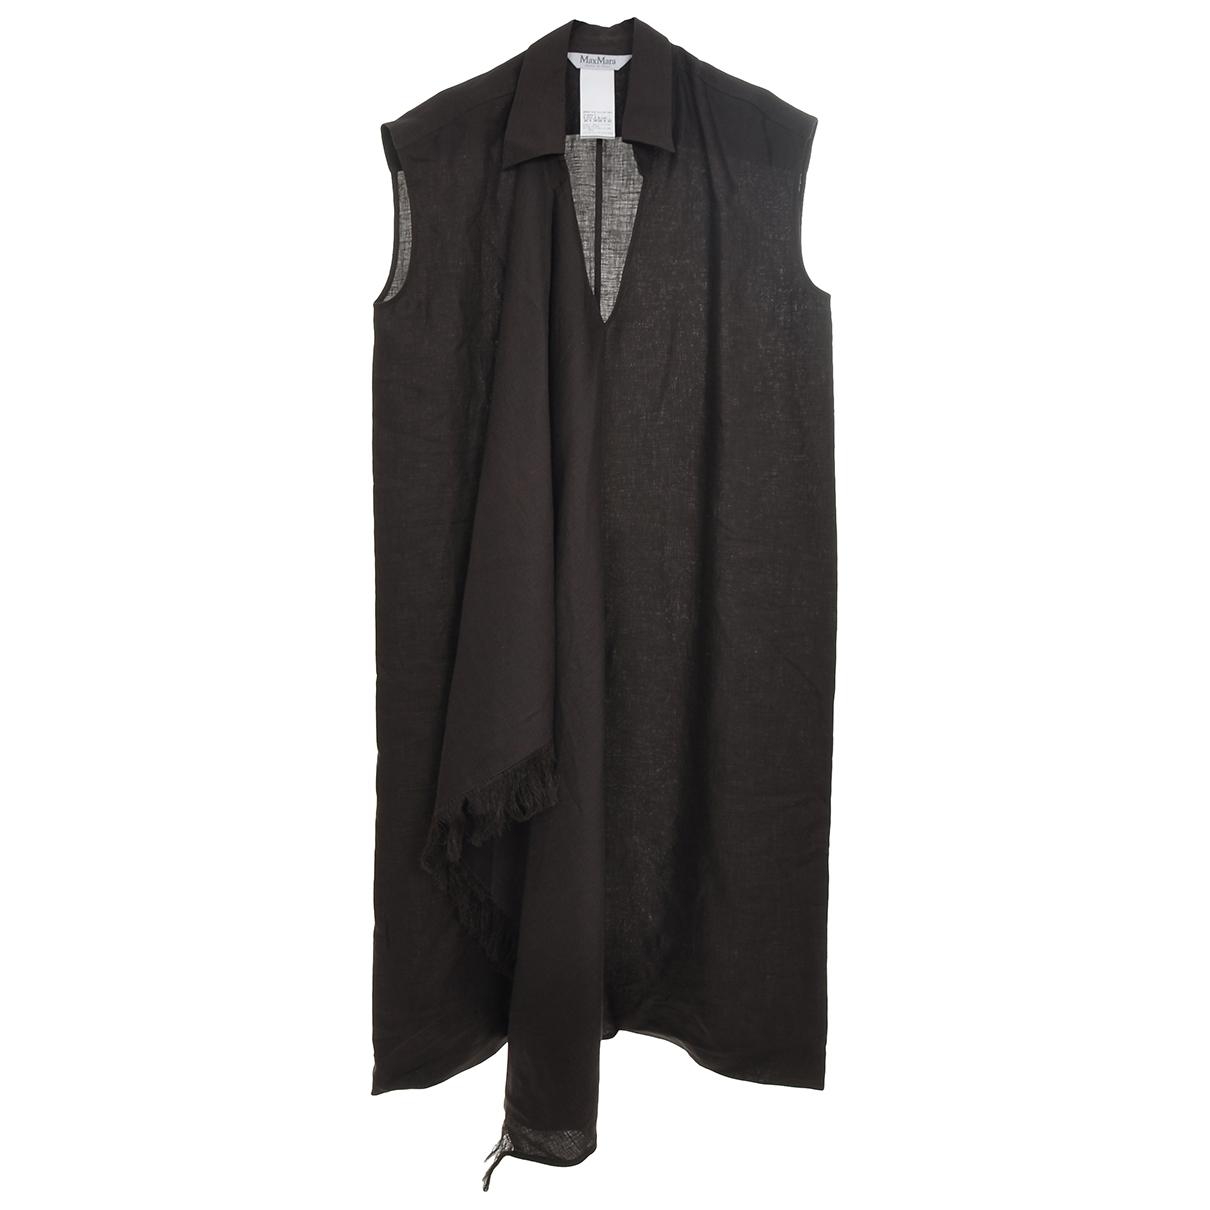 Max Mara \N Brown Linen dress for Women 40 IT